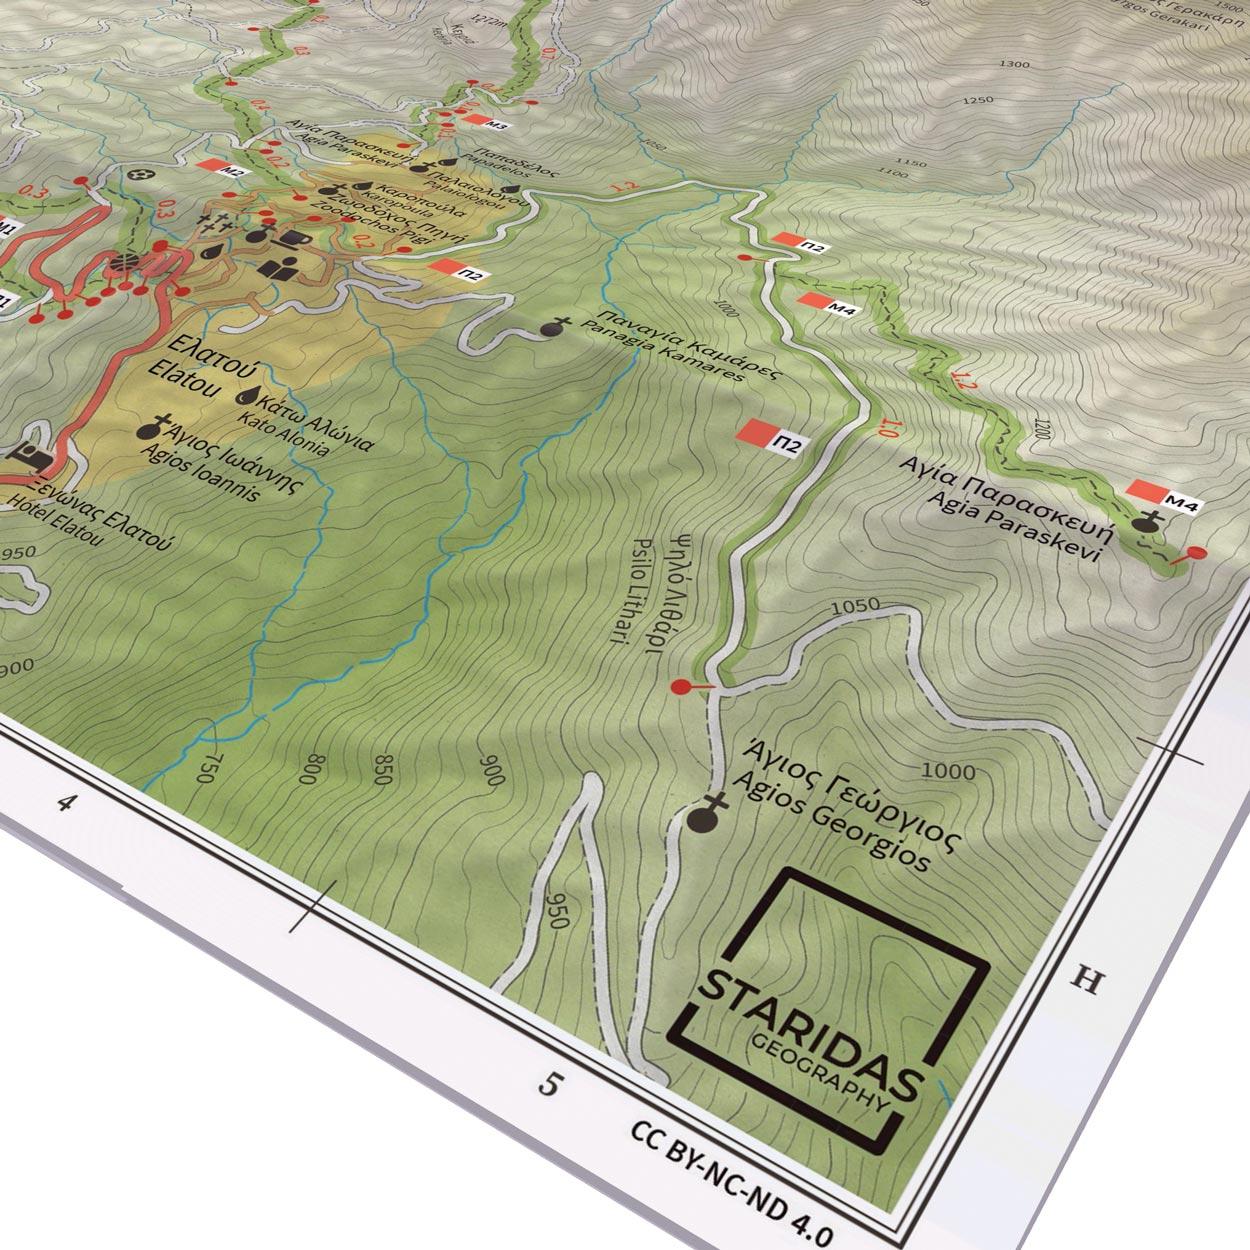 Elatou Trails - Side A